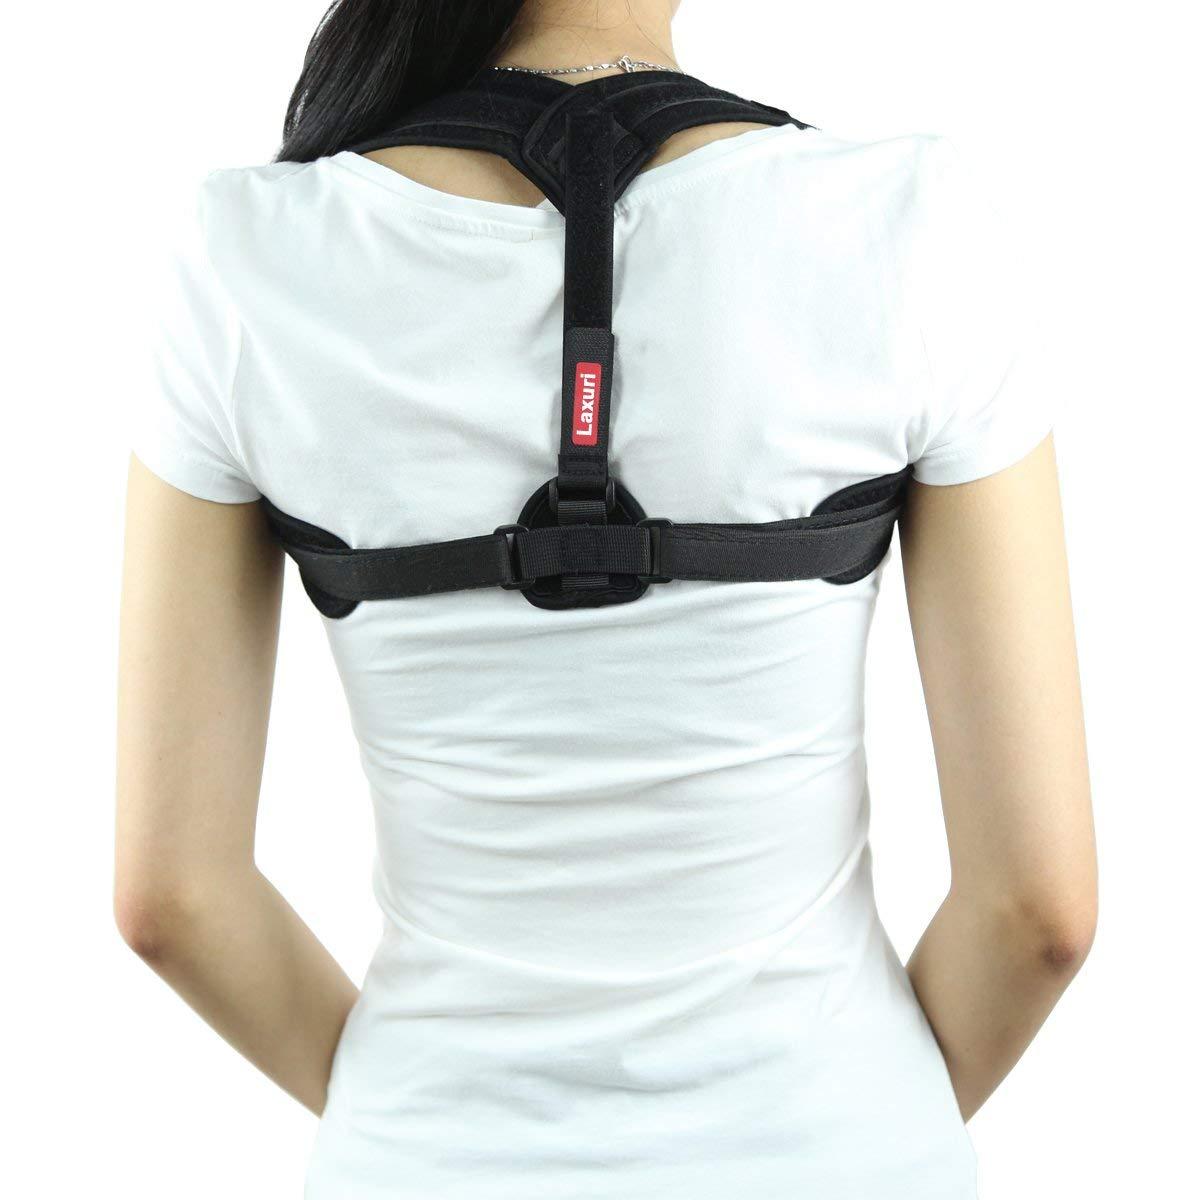 Laxuri C250 Back Brace Posture Corrector, Comfortable Upper Back Support & Shoulder Brace for Women Men Kids-Adjustable Prevent Slouching and Pain Relief (PC250 Full Black, Large)